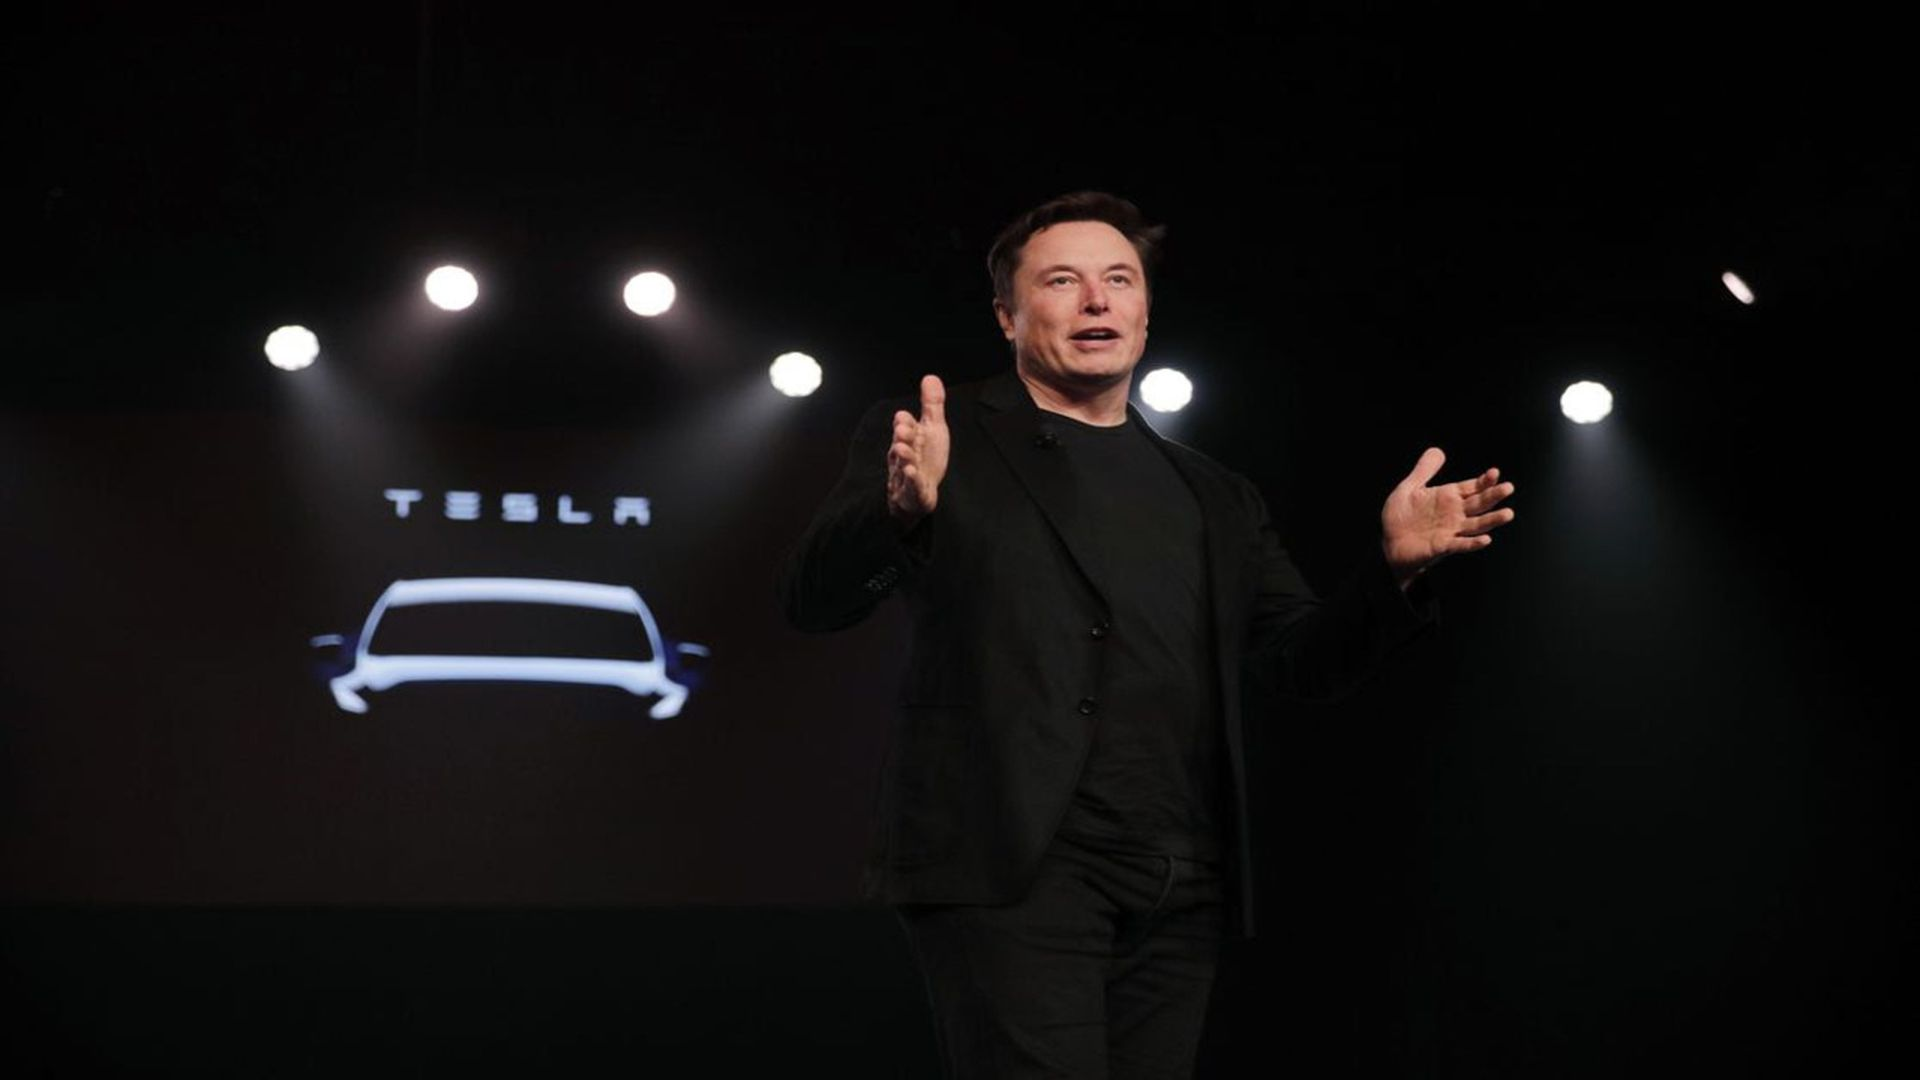 Musk unveils the Model Y at Tesla's design studio in Hawthorne, Calif., in March. Photo: Jae C. Hong/AP